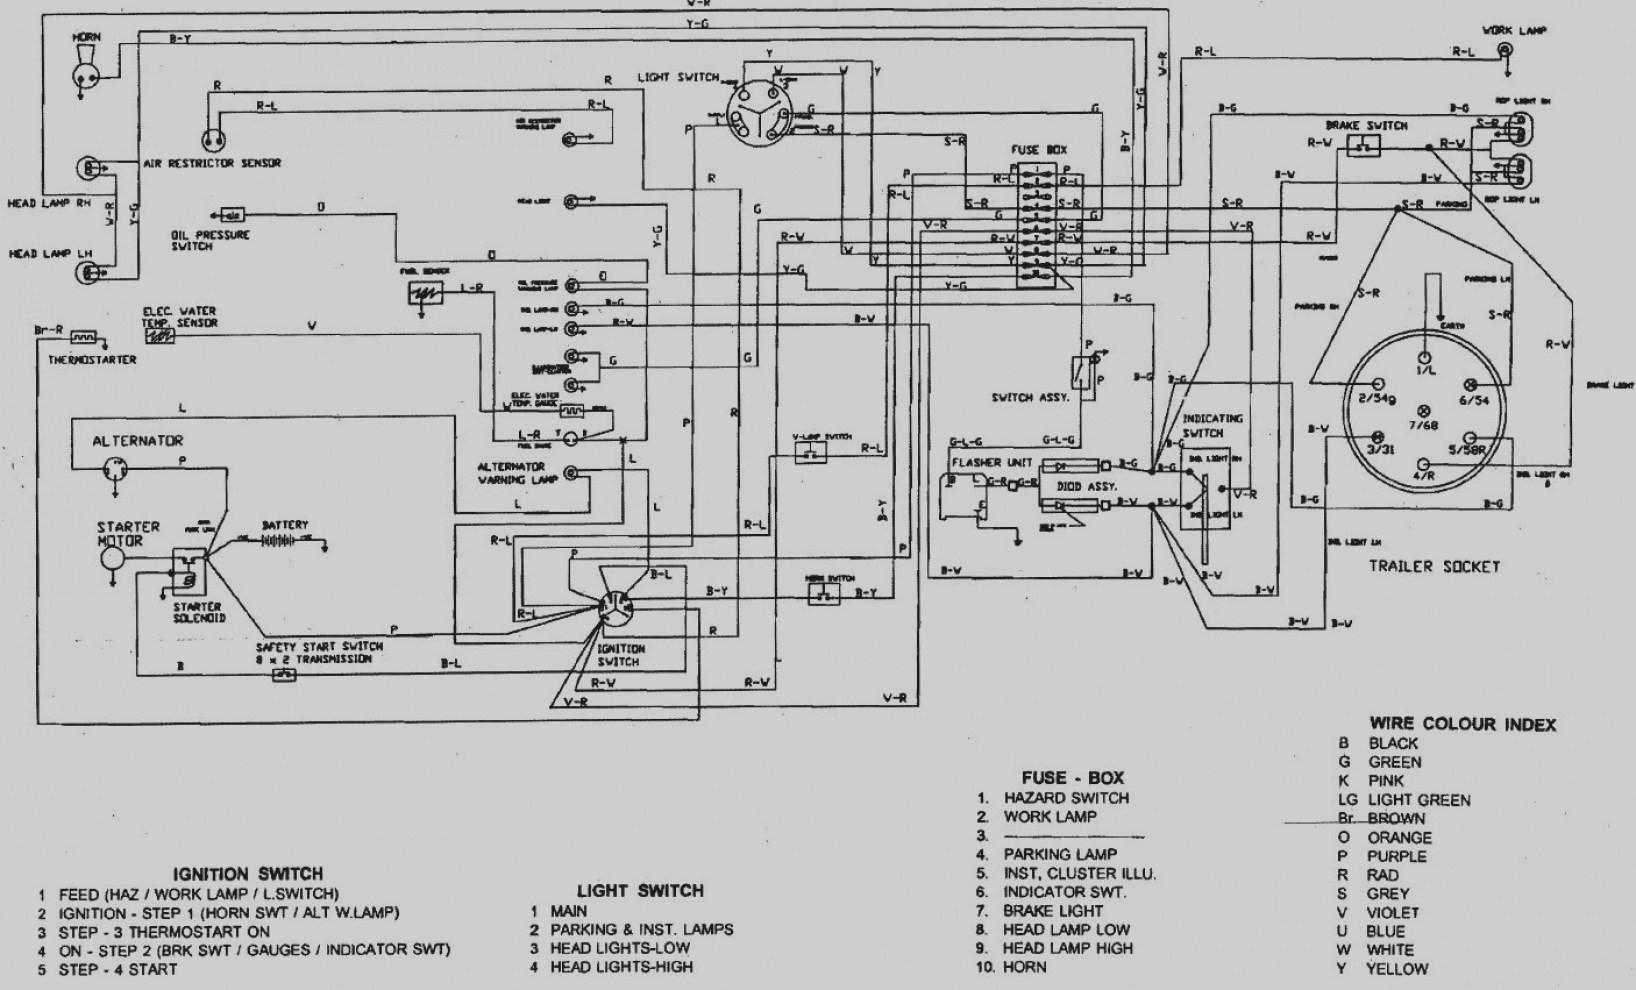 DIAGRAM] Case 450c Wiring Diagram FULL Version HD Quality Wiring Diagram -  DIAGRAMDUCK.COMTESSEGREFFULHE.FR | John Deere 450c Wiring Diagram Free Picture |  | diagramduck.comtessegreffulhe.fr